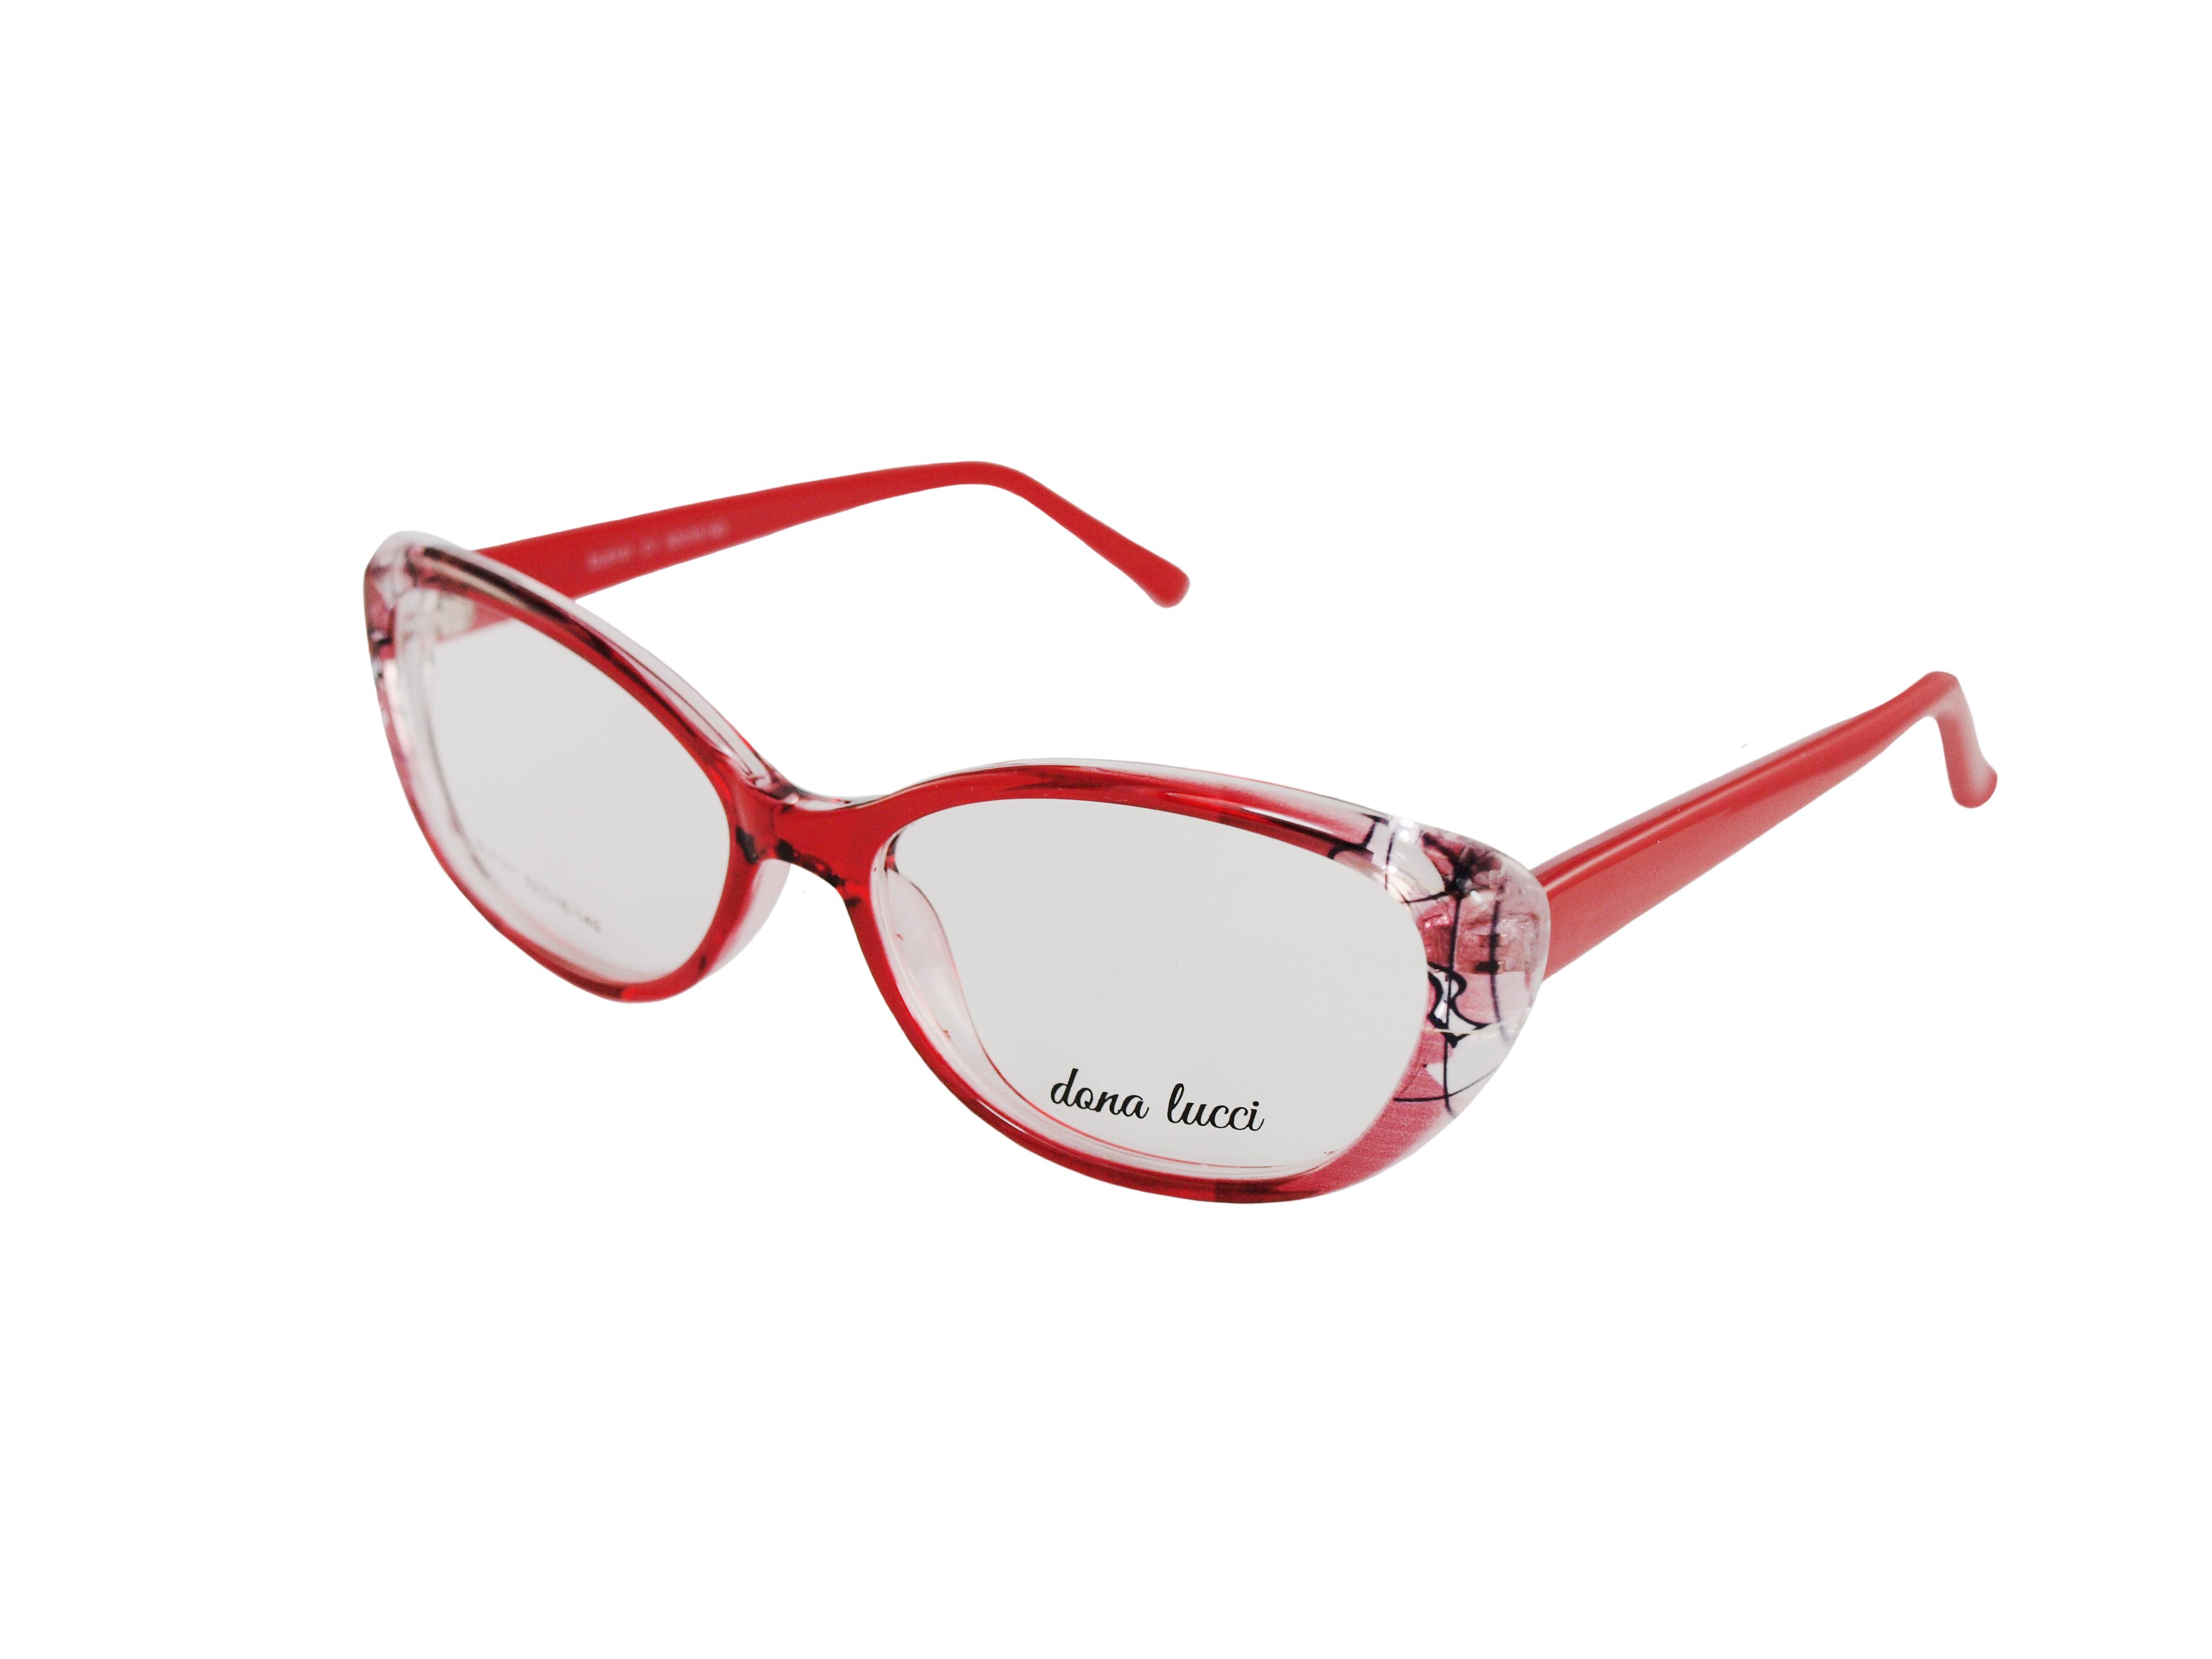 Dámske plastové červené dioptrické okuliare 0731